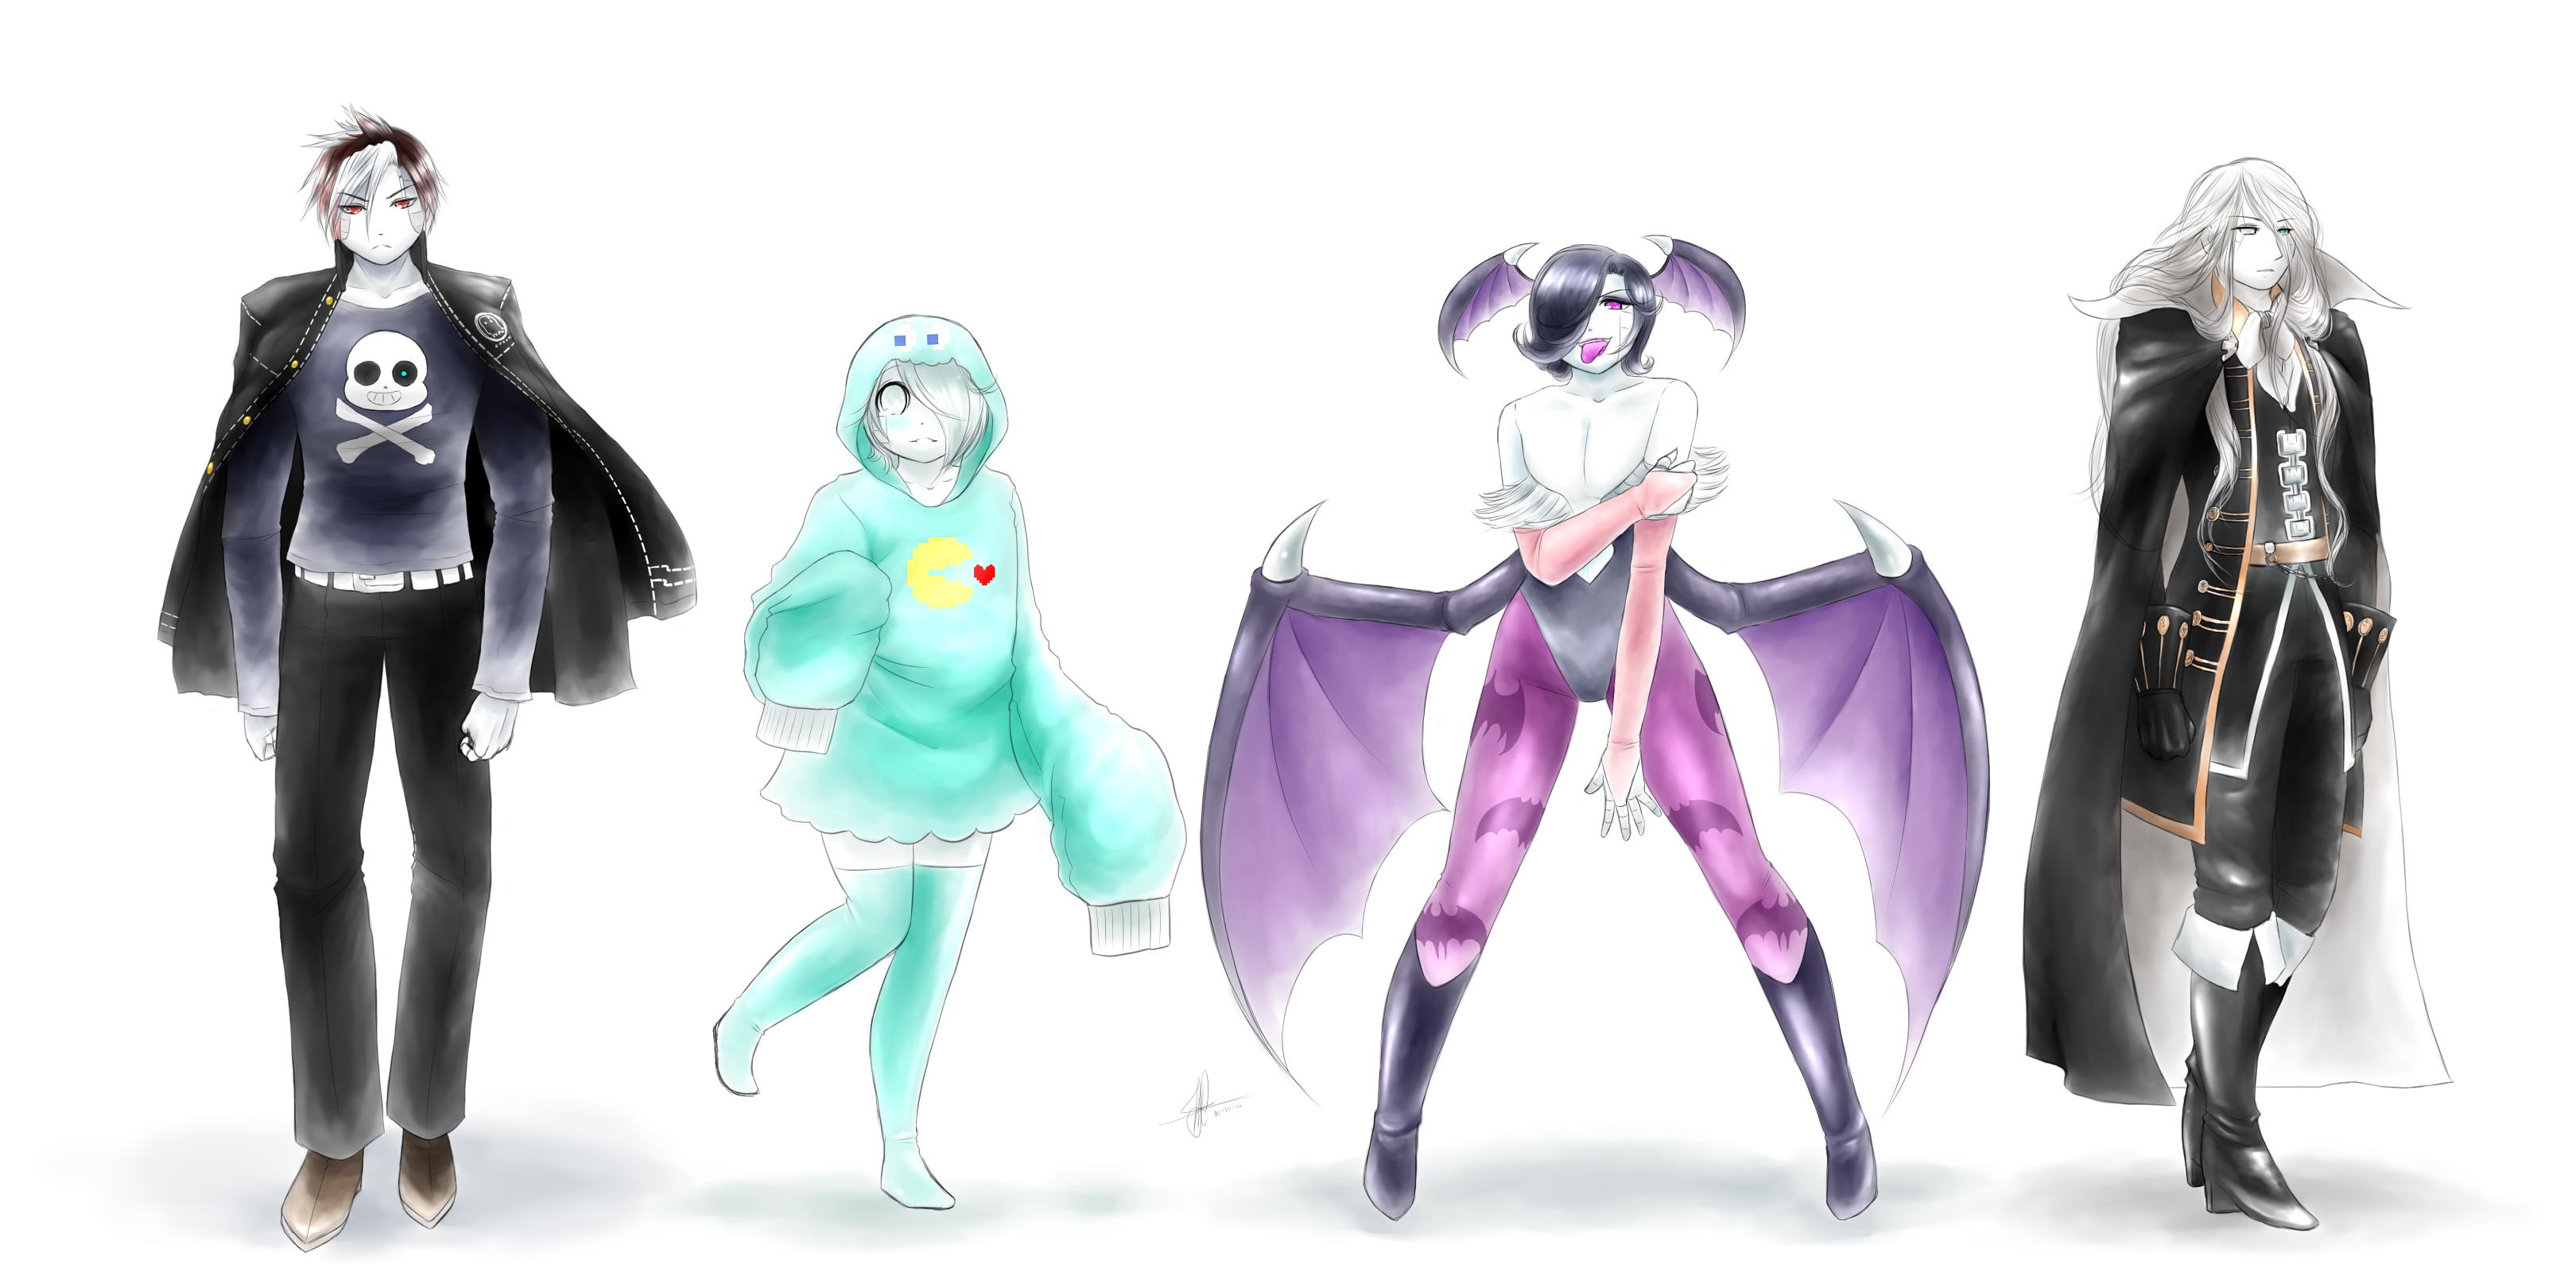 Undertale] Halloween!: ACID tears robots by MayJasmine on DeviantArt